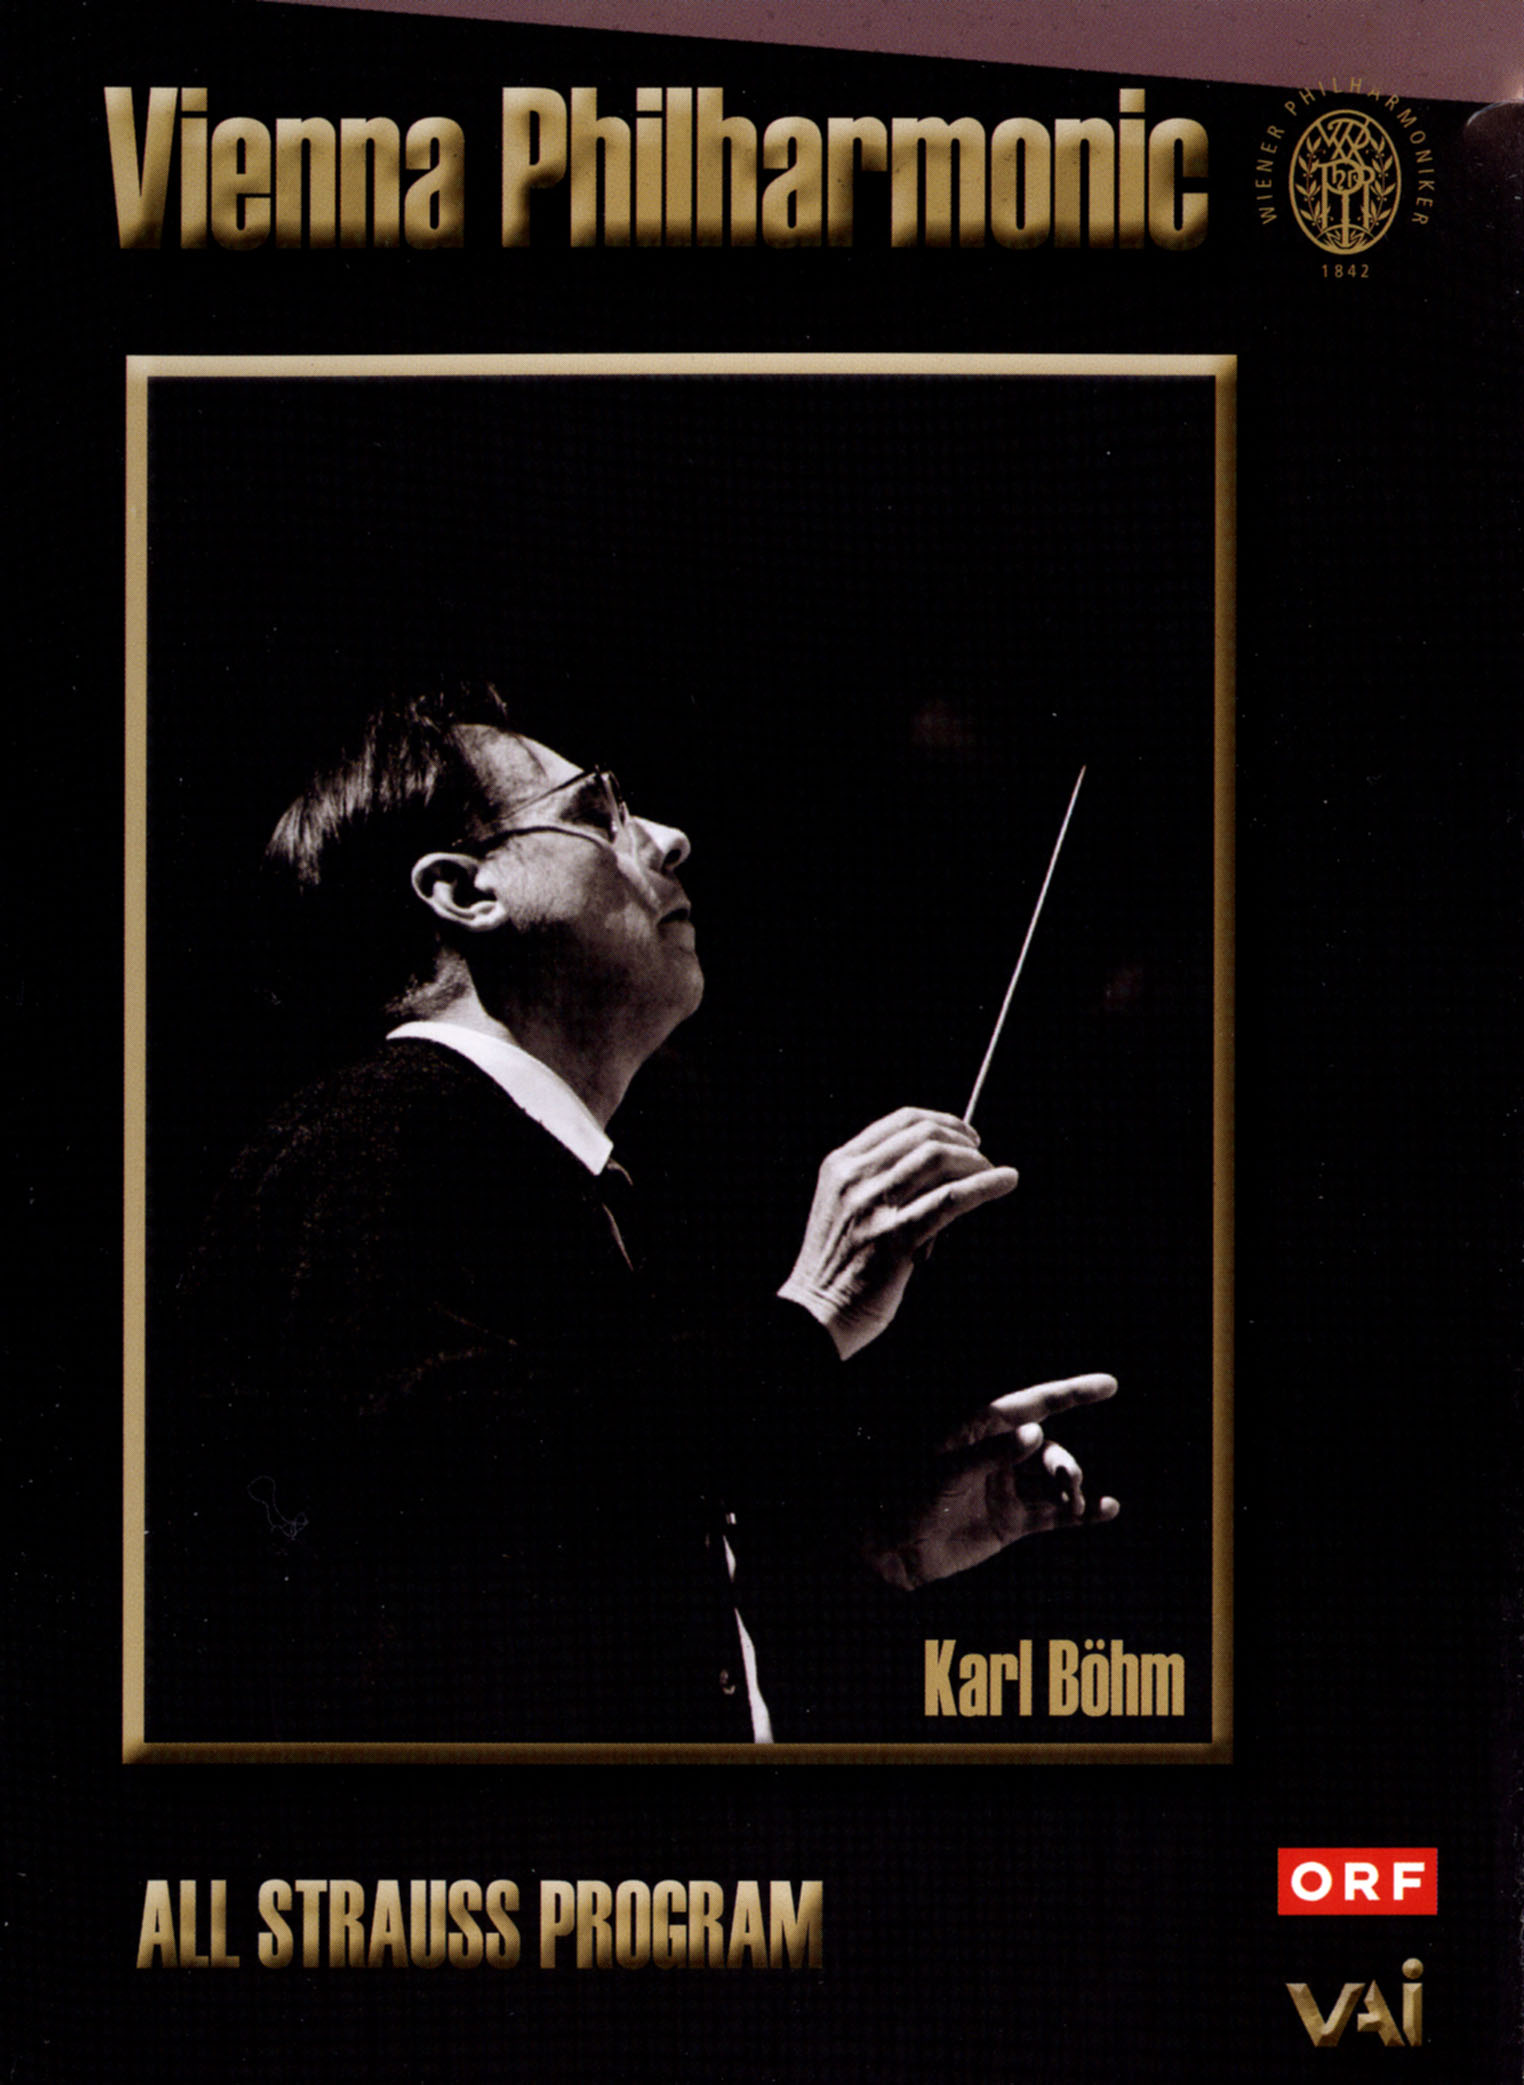 Vienna Philharmonic/Karl Bohm: All Strauss Program